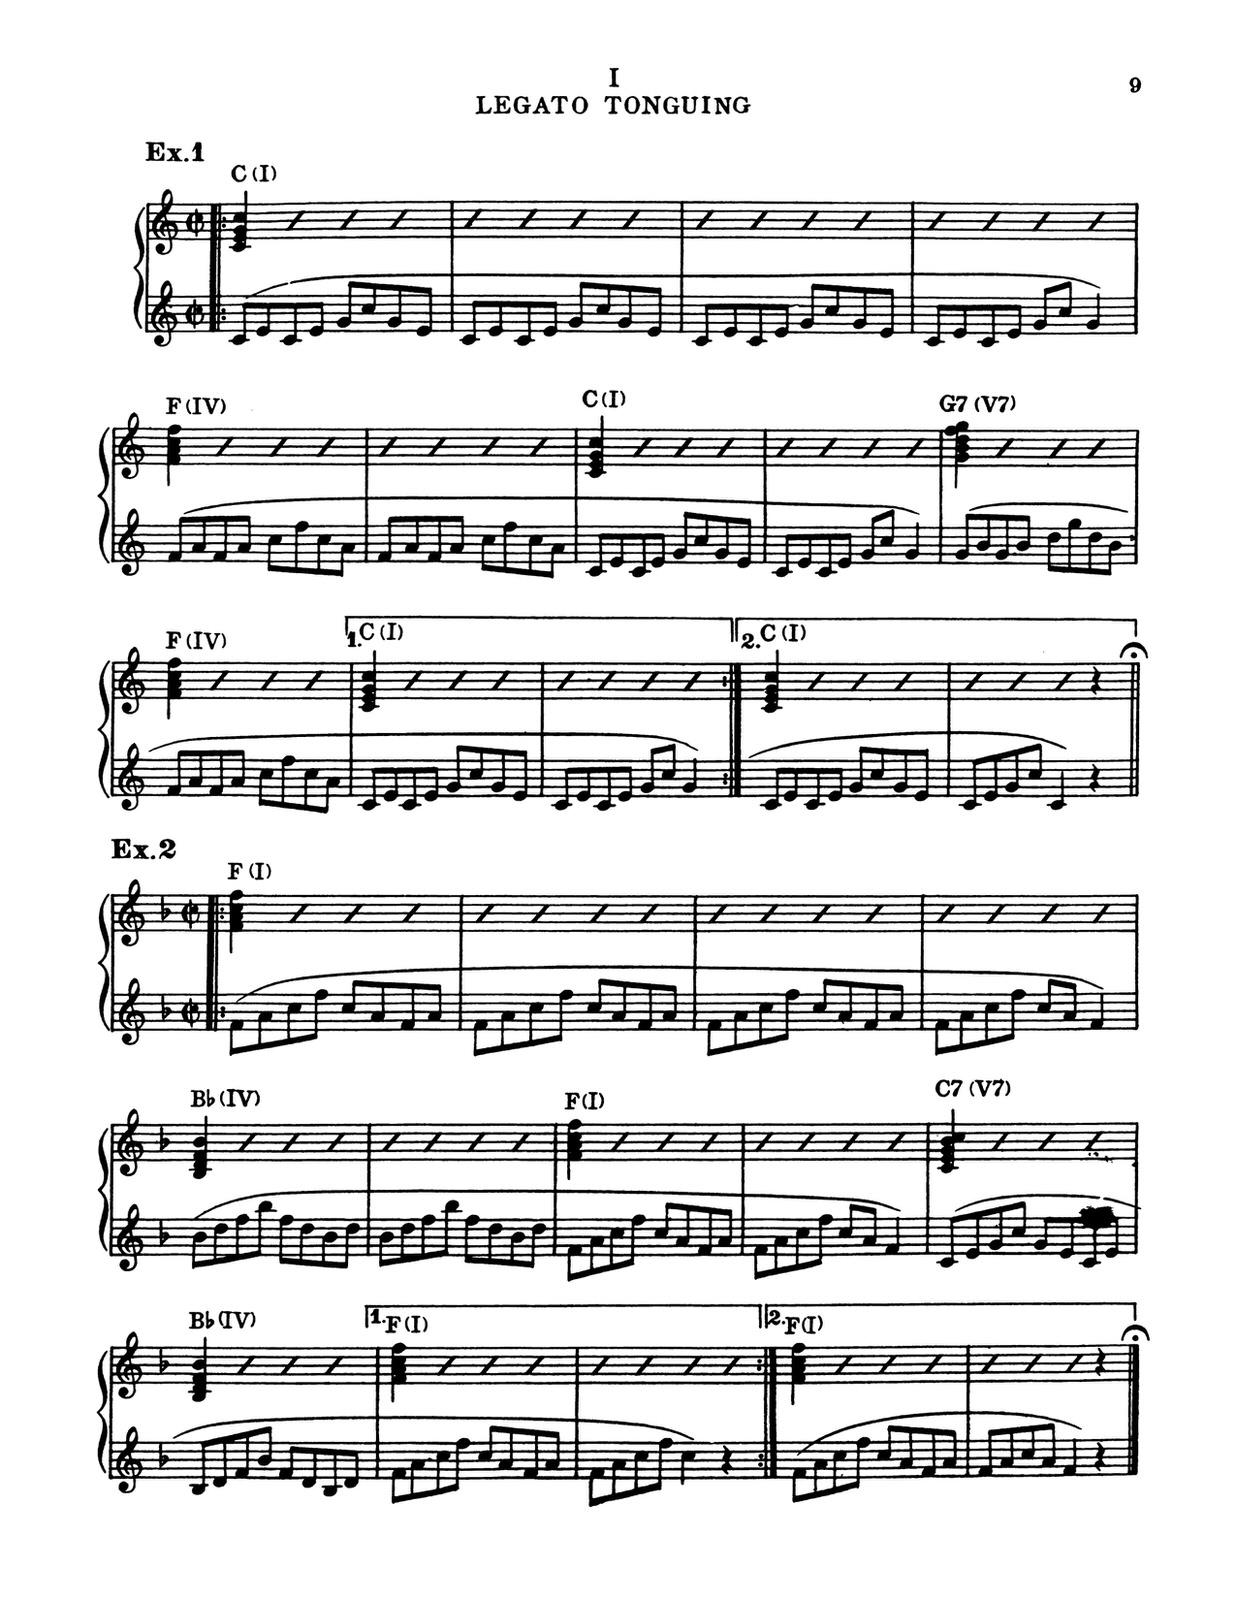 james-harry-studies-and-improvisations-for-trumpet-3